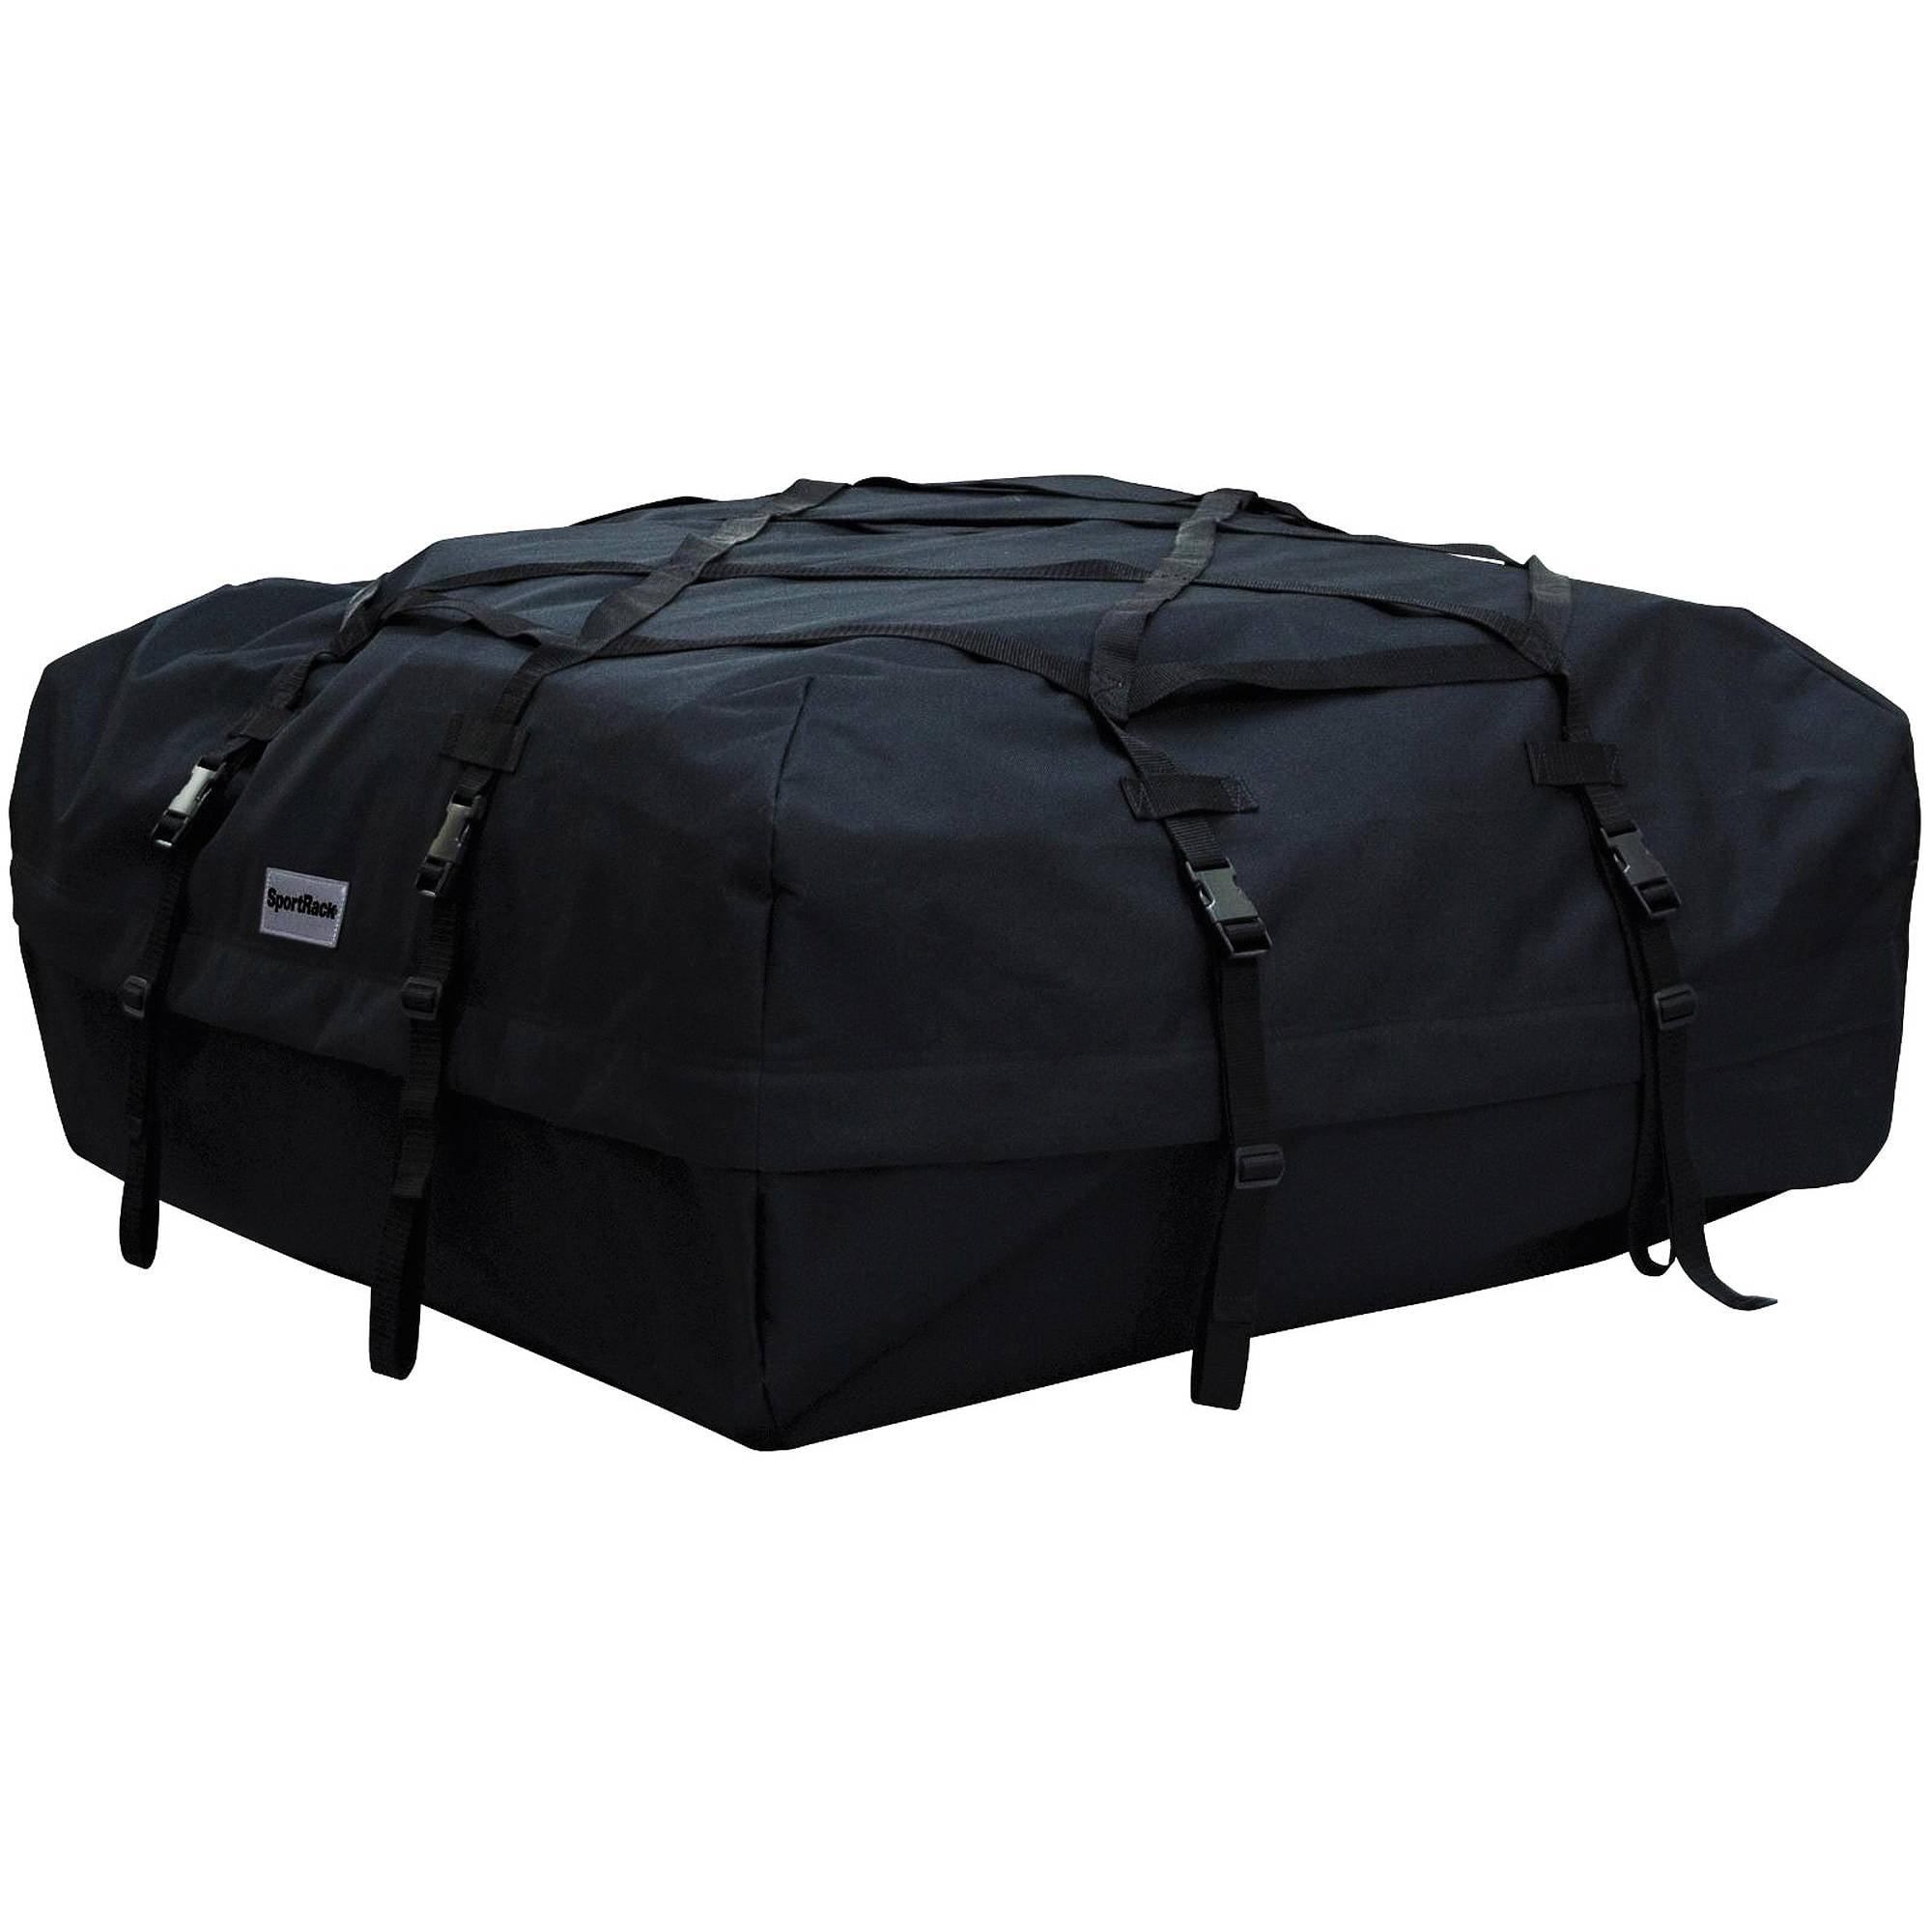 Sportrack Sherpa 13 Roof Bag Cargo Carri